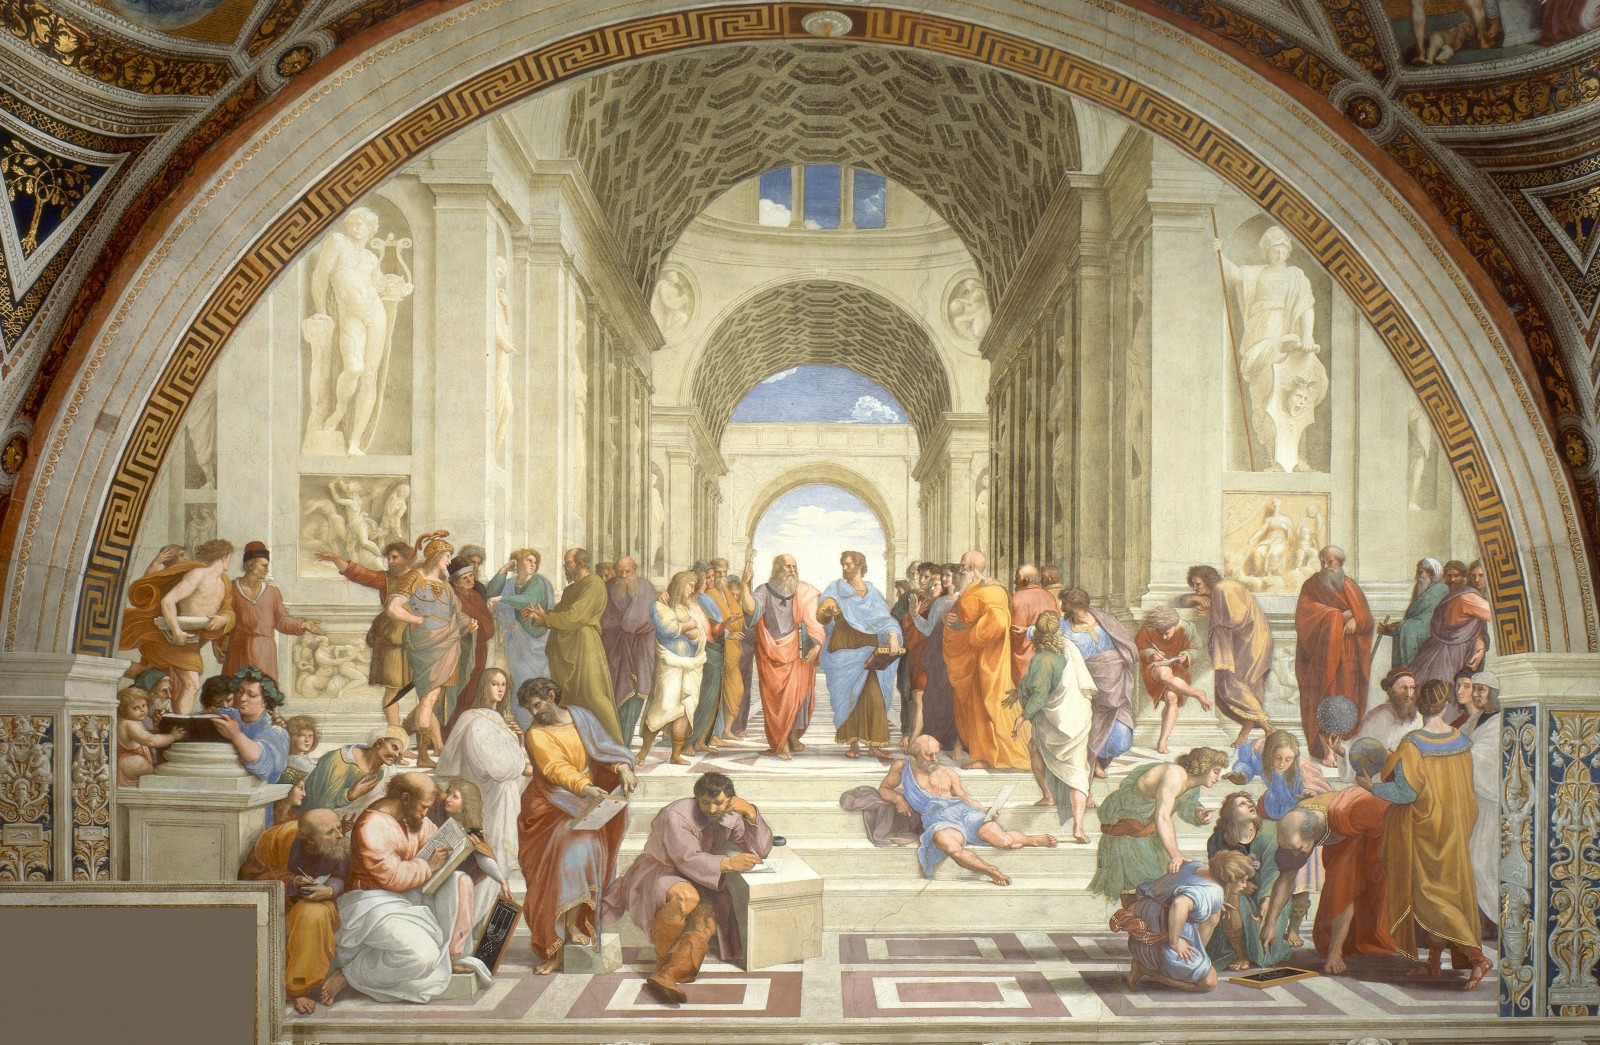 Debating, Ancient Greece style (Photo Credit: Raphael [Public domain], via Wikimedia Commons)